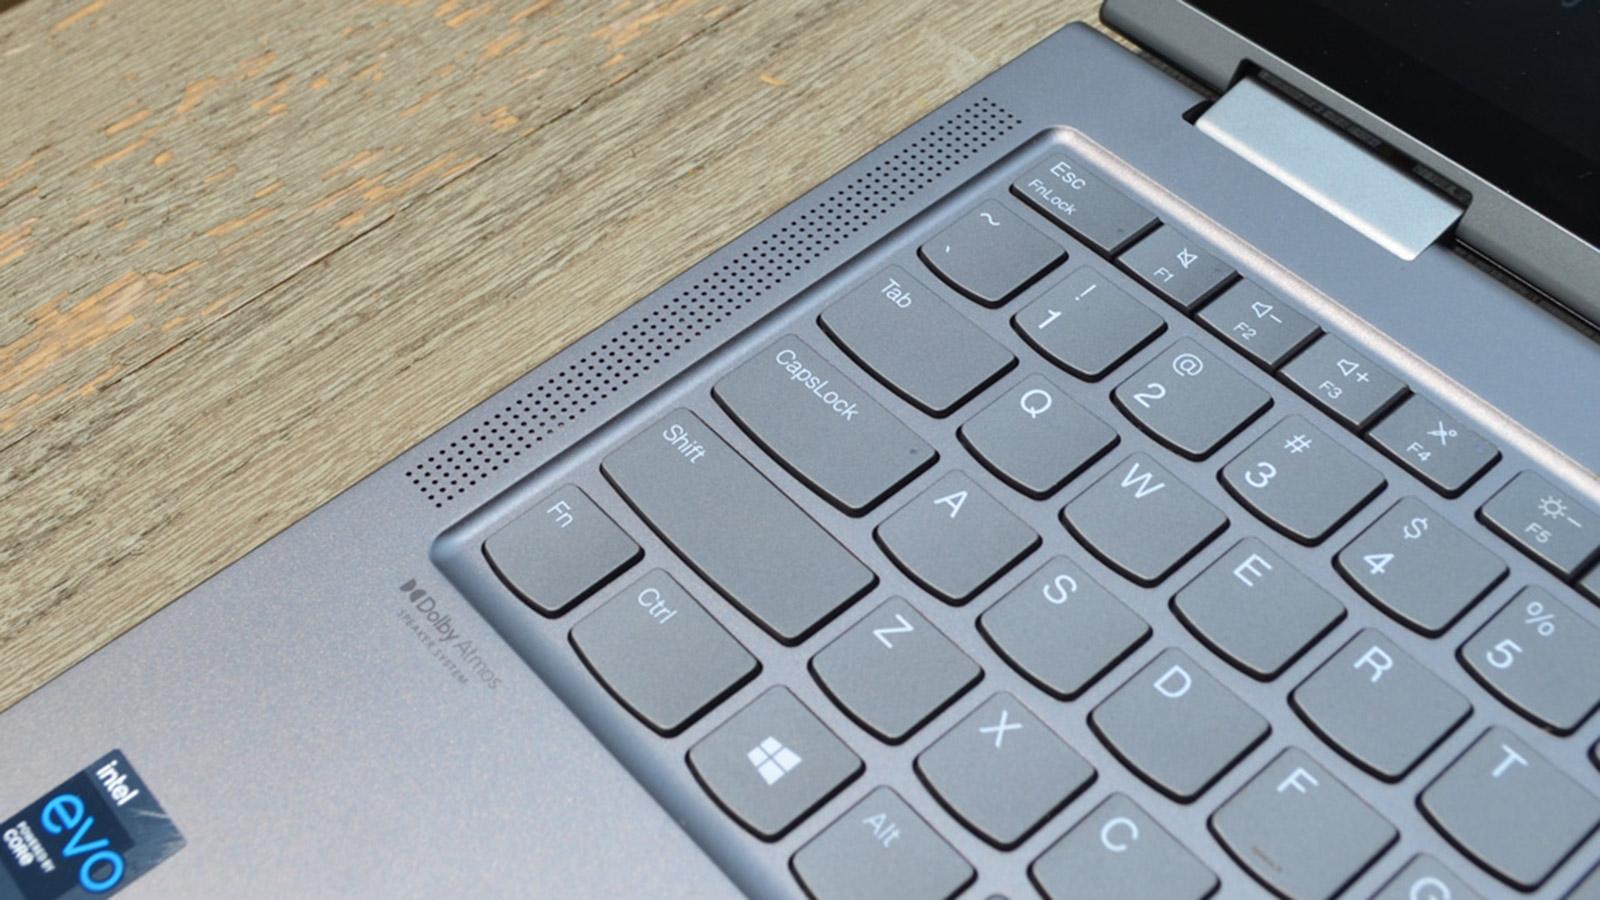 Lenovo ThinkPad X1 Yoga Gen 6 Speakers